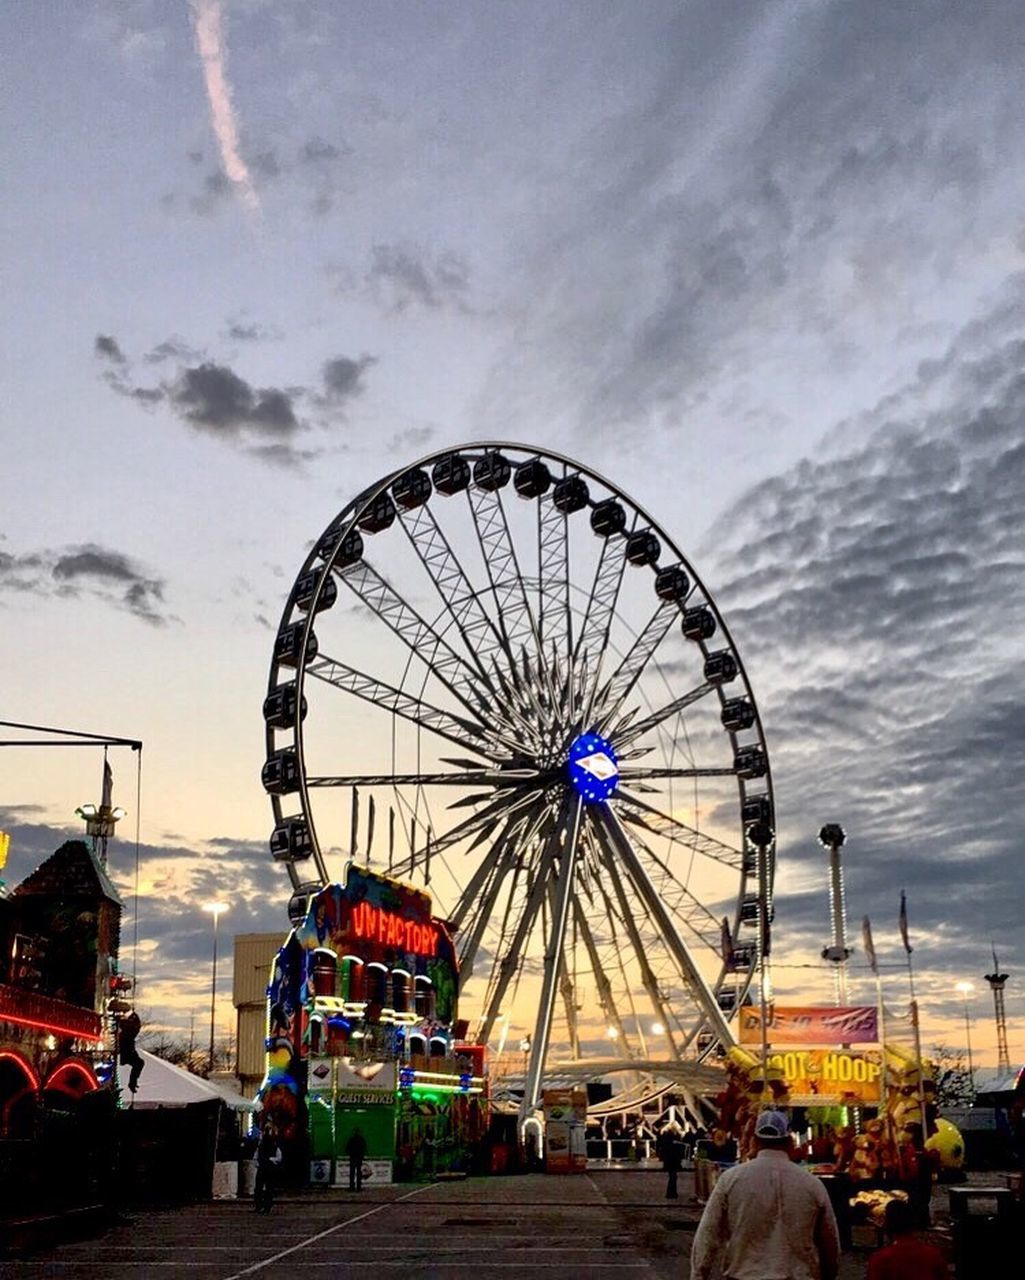 amusement park, arts culture and entertainment, ferris wheel, cloud - sky, amusement park ride, sky, leisure activity, big wheel, outdoors, low angle view, day, built structure, architecture, nature, no people, carousel